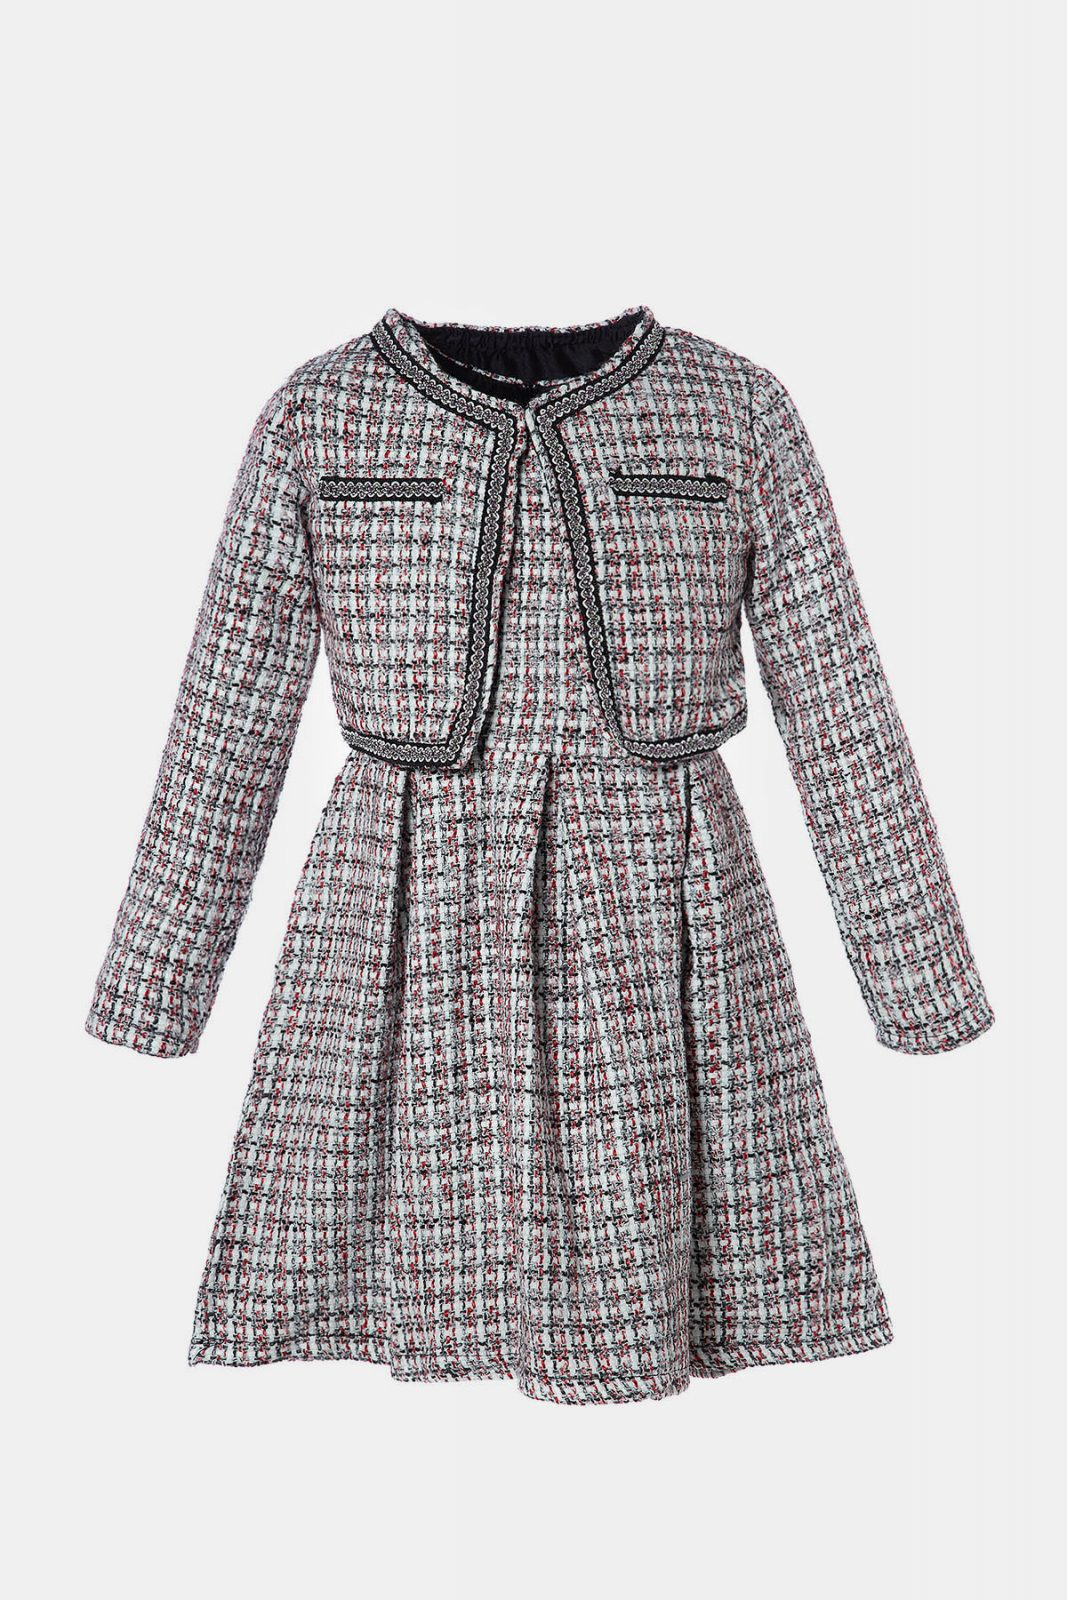 dccd1391a96 Καρό αμάνικο φόρεμα μαζί με ασορτί μπολερό για Κορίτσια 4-14 Ετών · Αρχική  σελίδαΠΡΟΣΦΟΡΕΣΦΘΙΝΟΠΩΡΟ ...